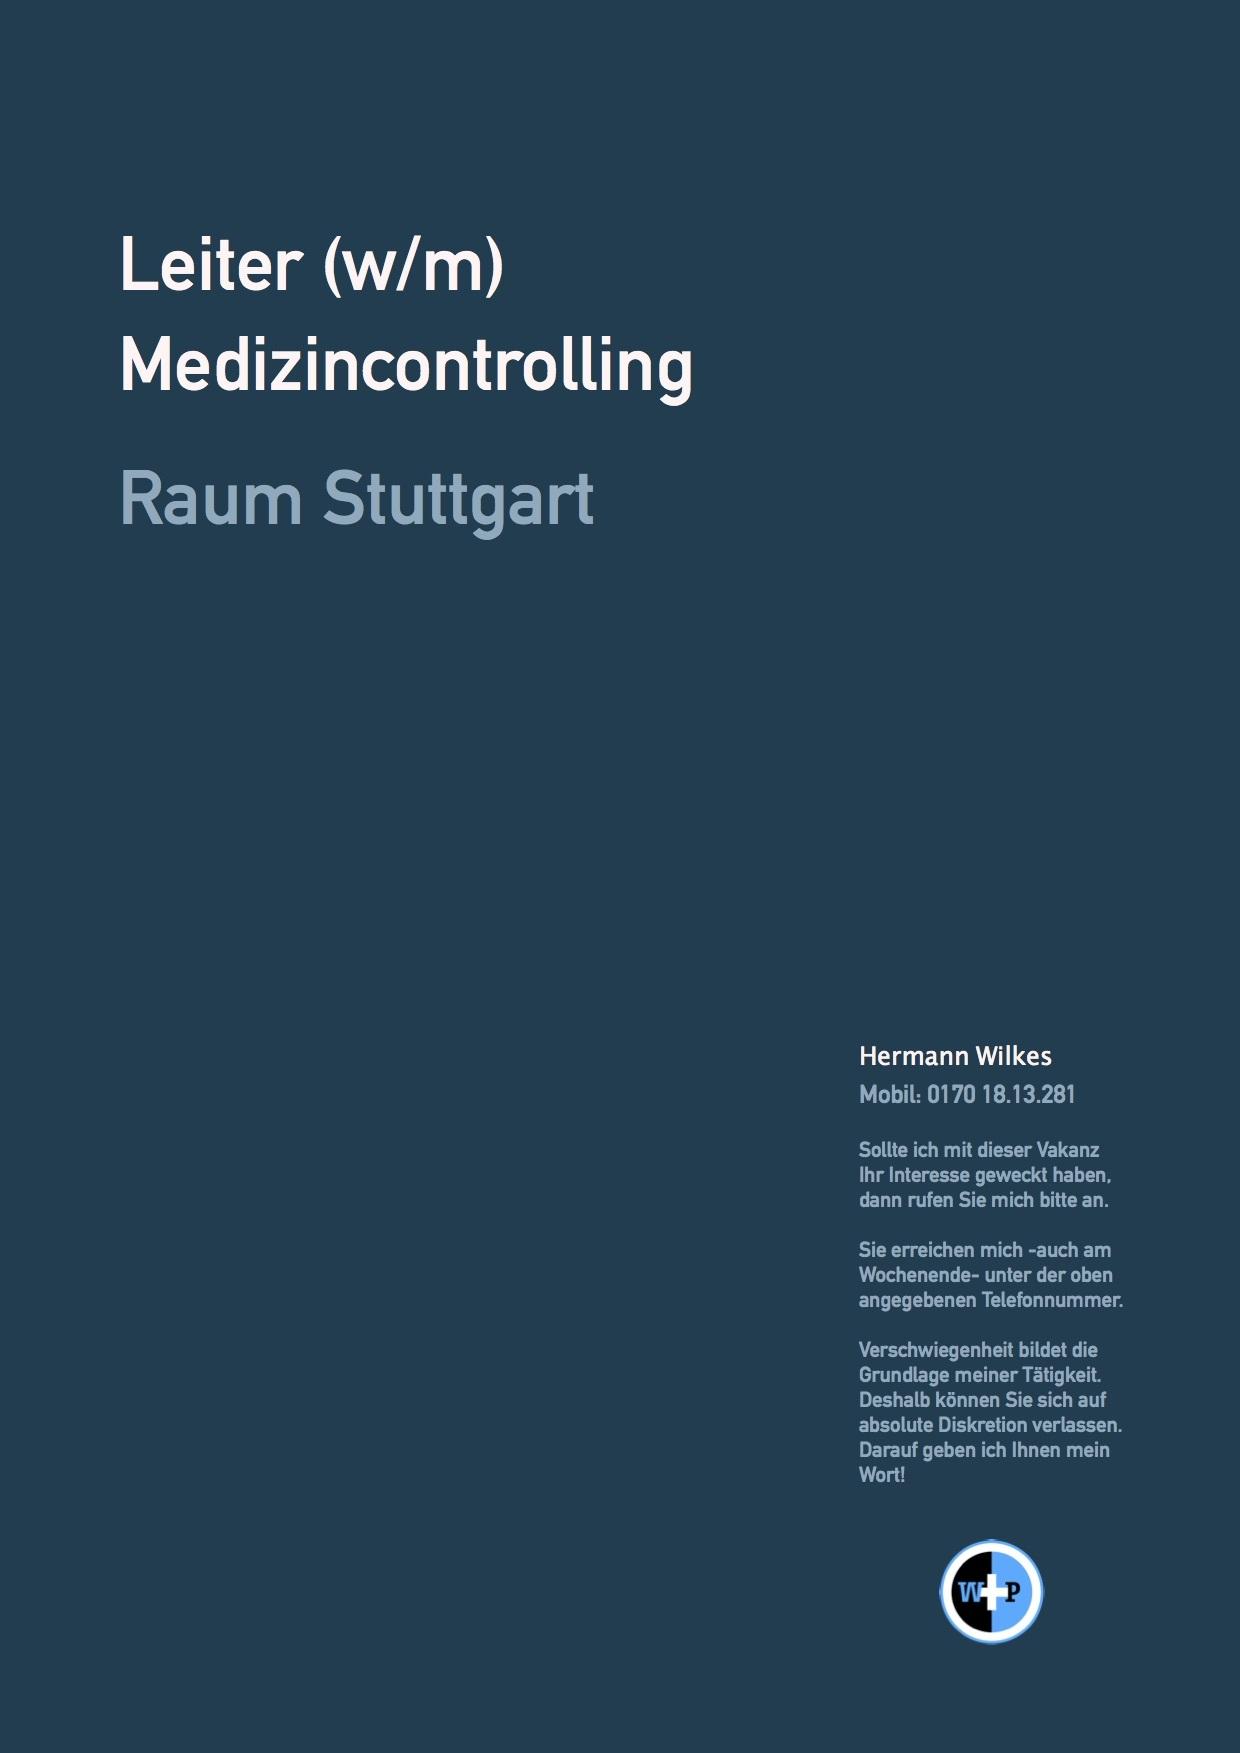 Leiter (w/m) Medizincontrolling - Raum Stuttgart